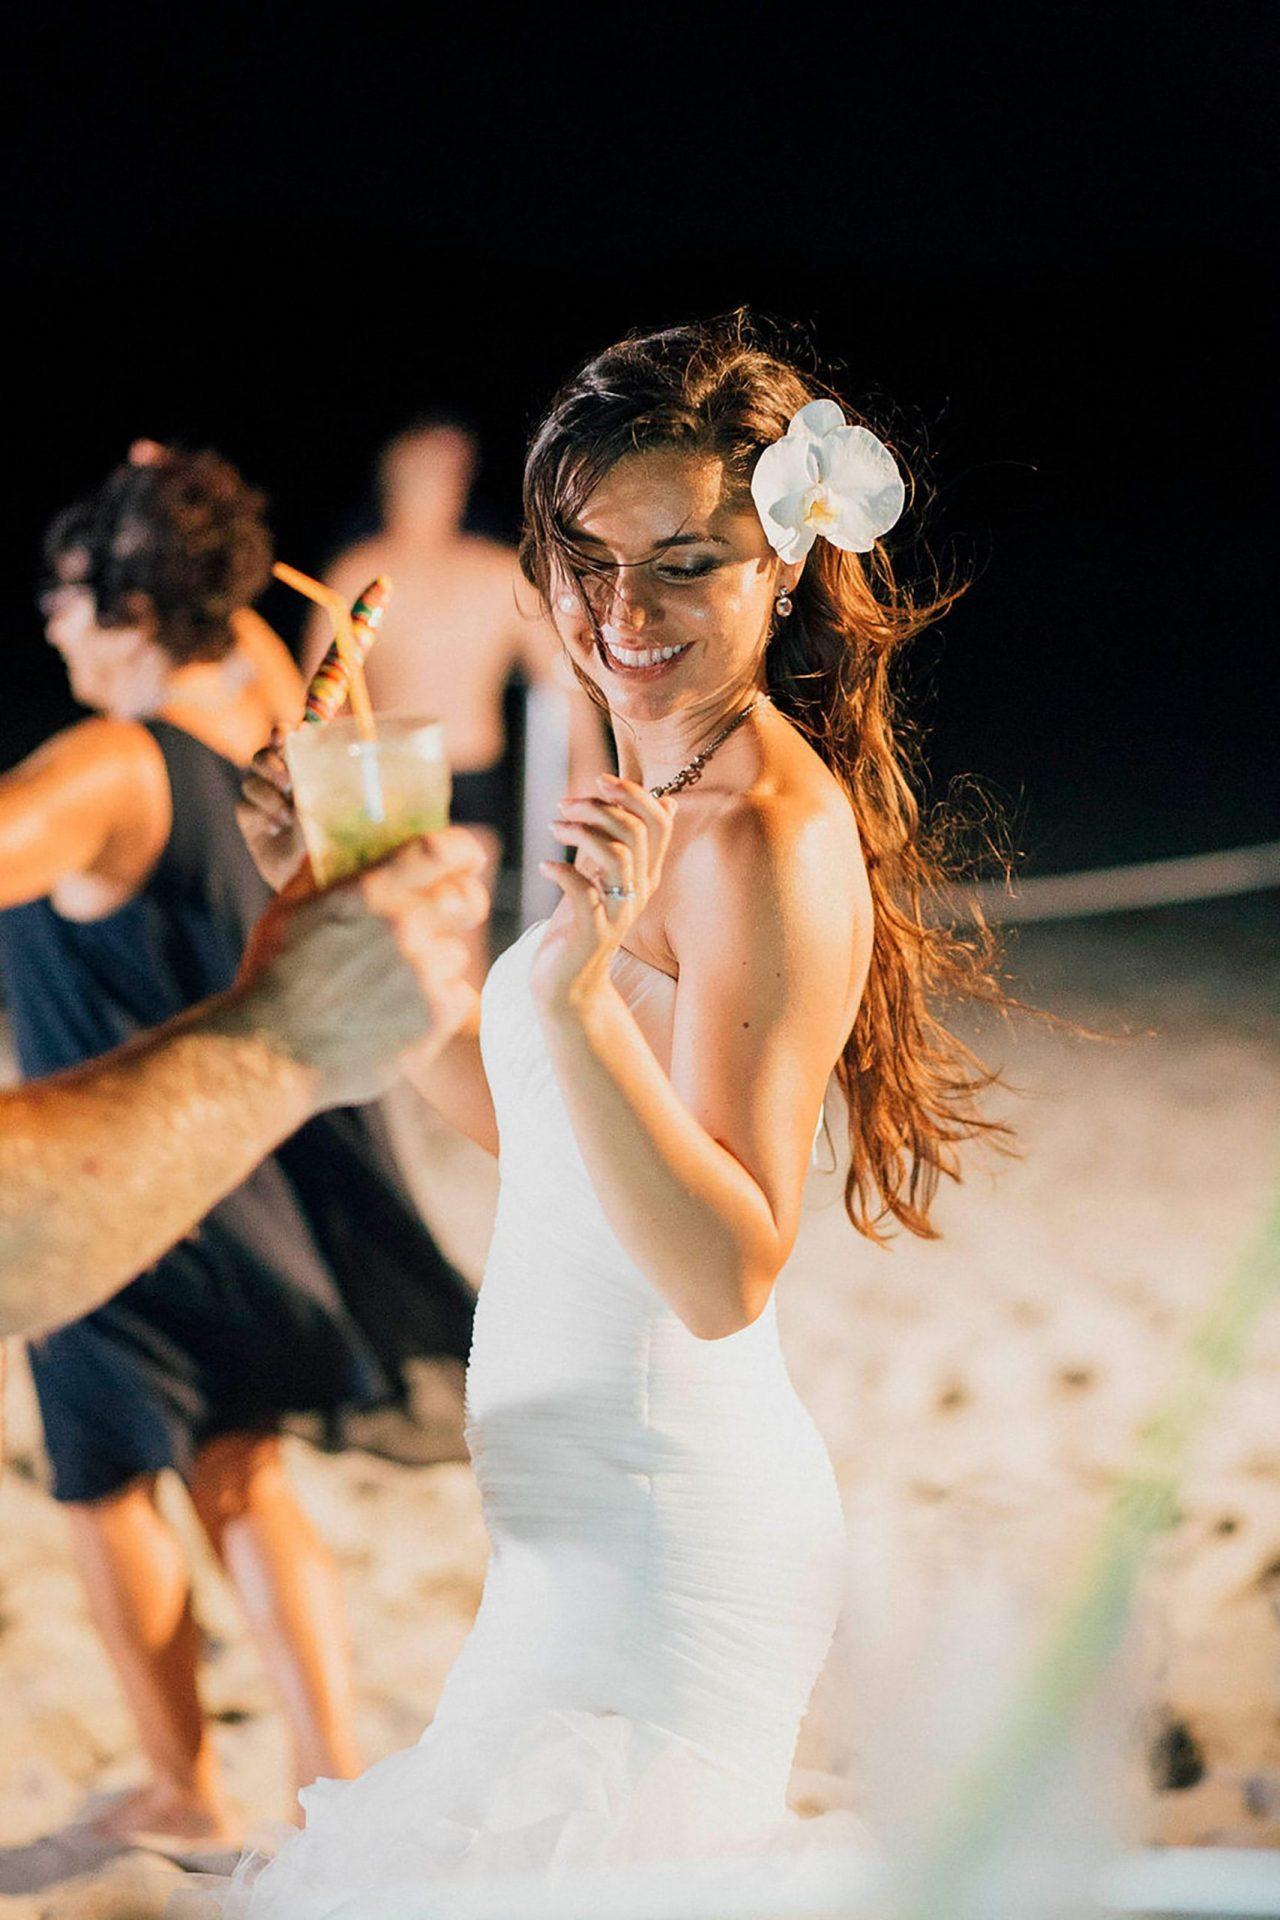 Andrea and Sebastien, bride